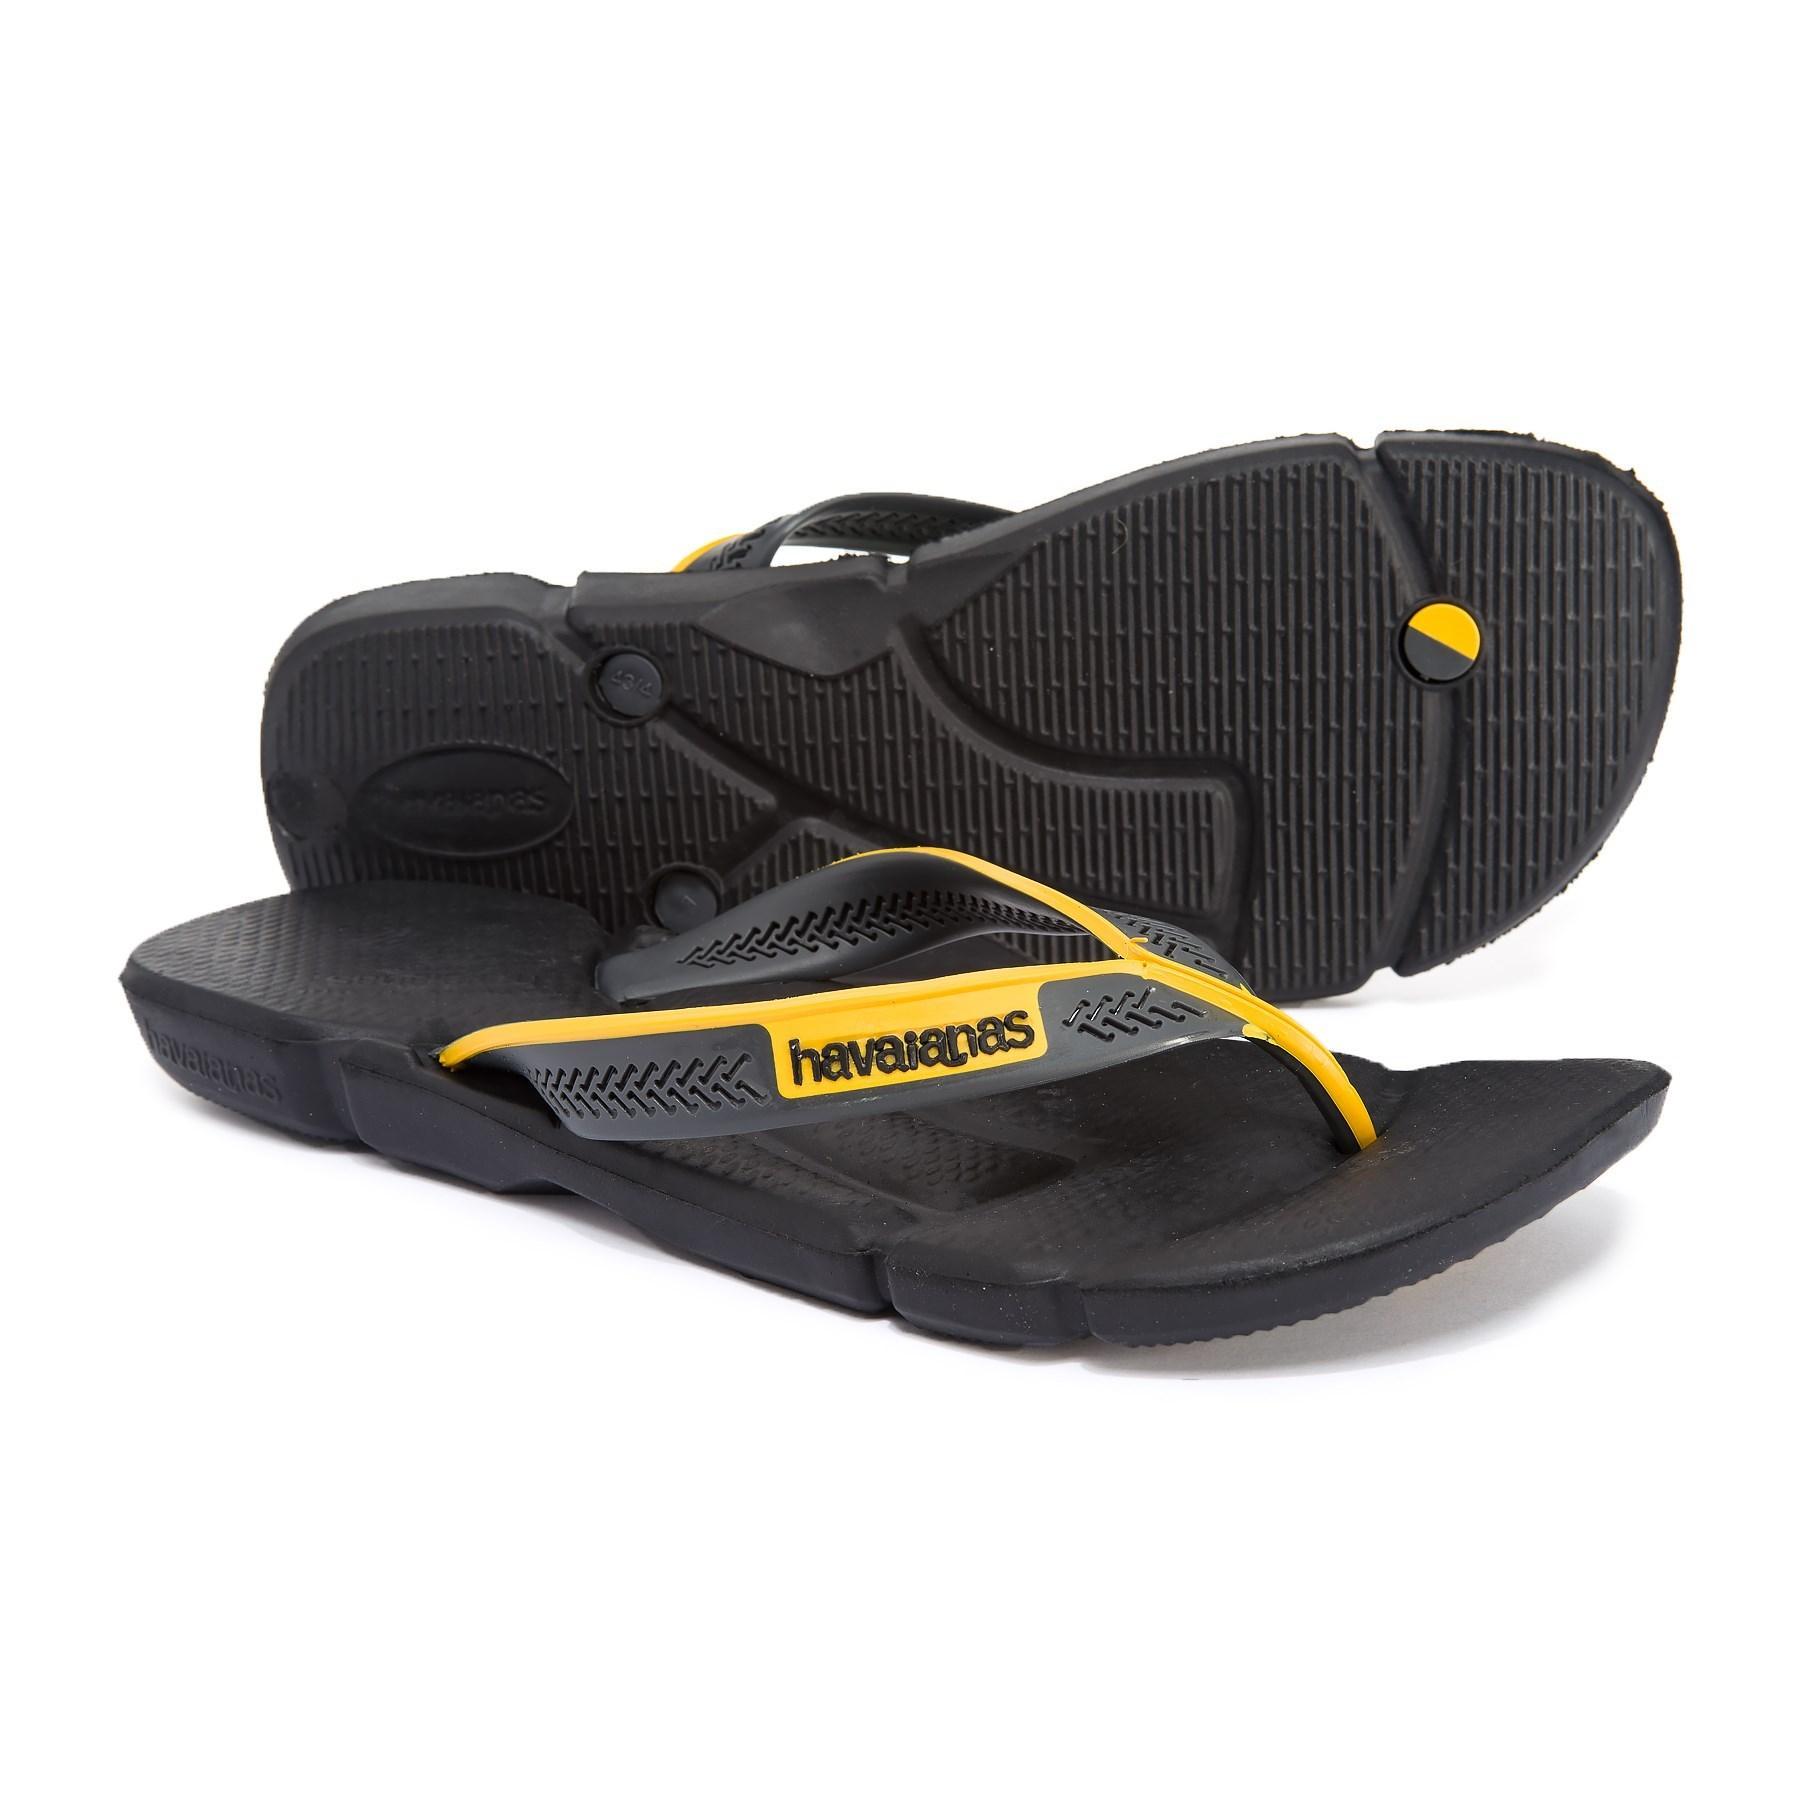 3b30896d8a6 Havaianas - Gray Power Flip-flops (for Men) for Men - Lyst. View fullscreen